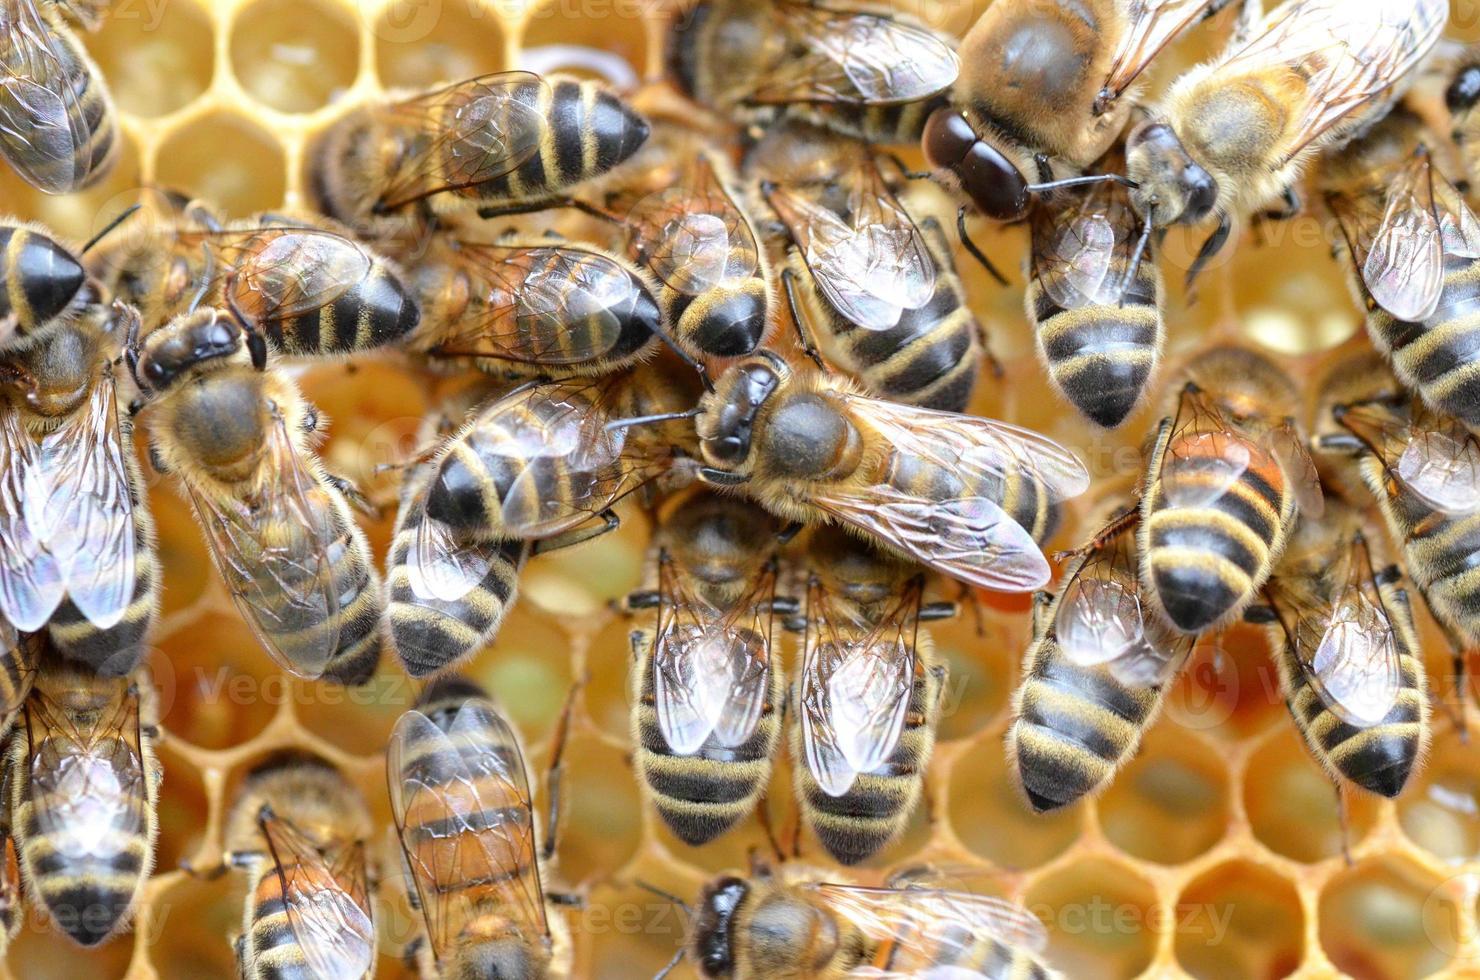 api laboriose a nido d'ape foto